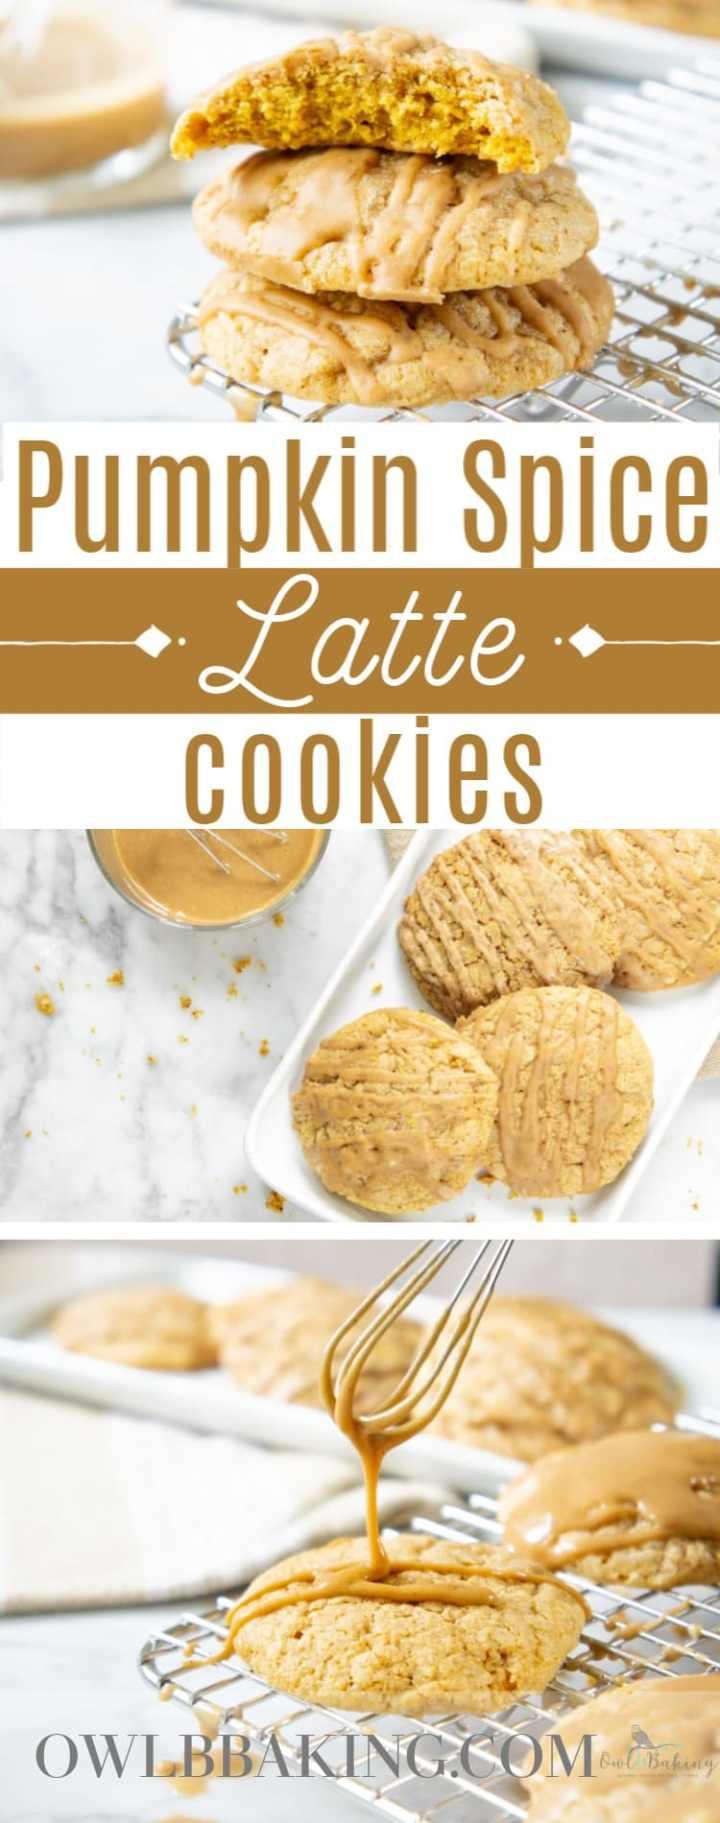 Pumpkin Spice Latte Cookies